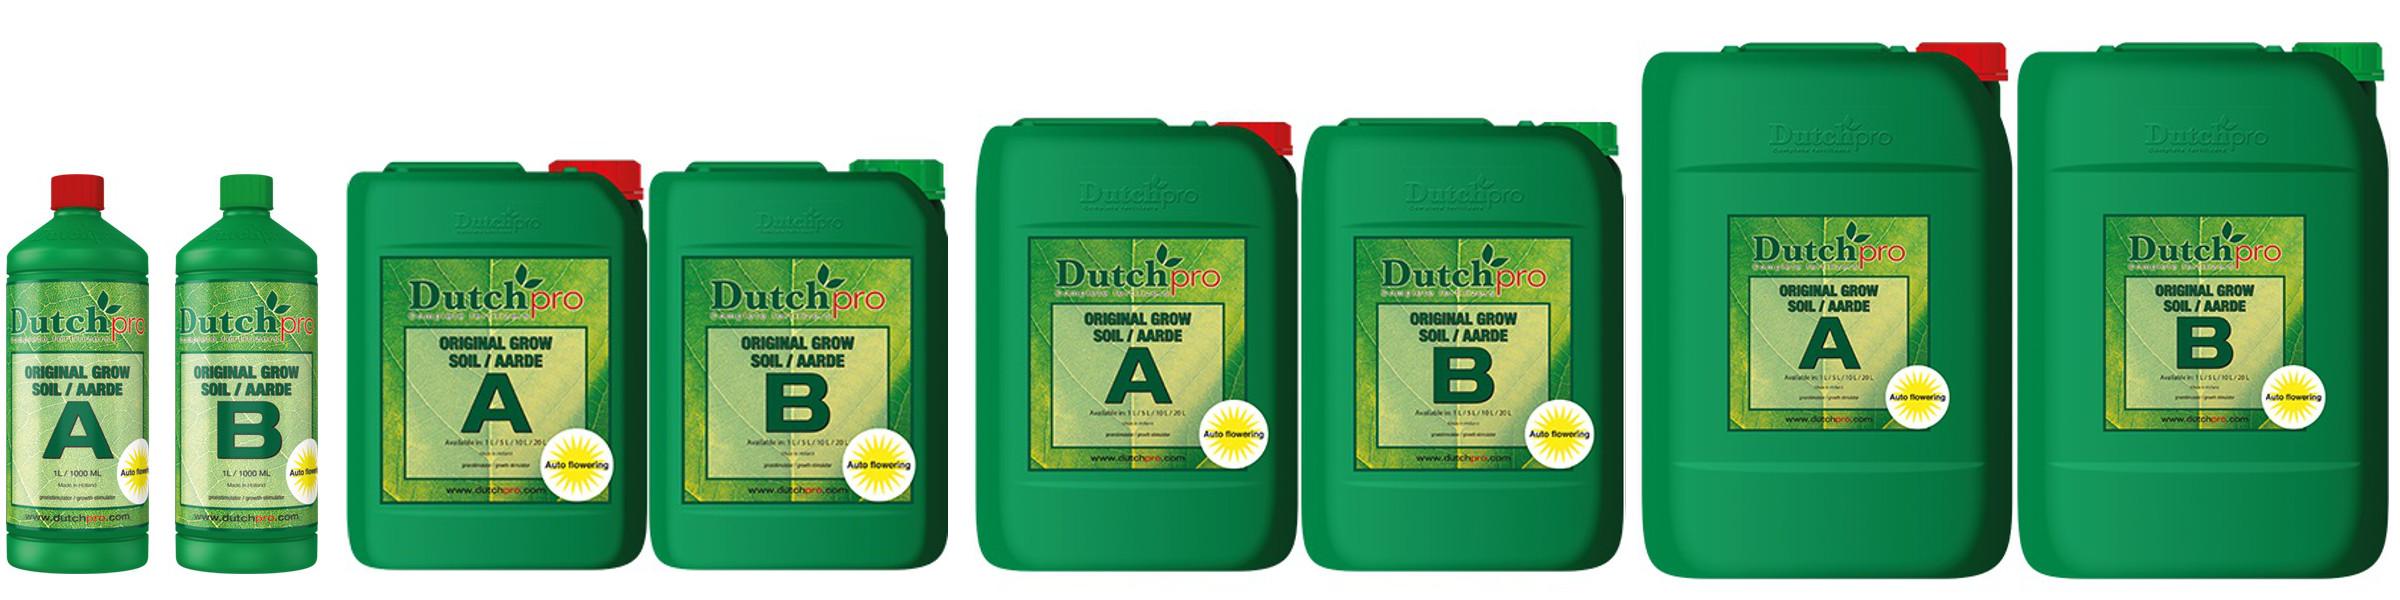 Dutchpro Soil Grow A+B Auto Flower